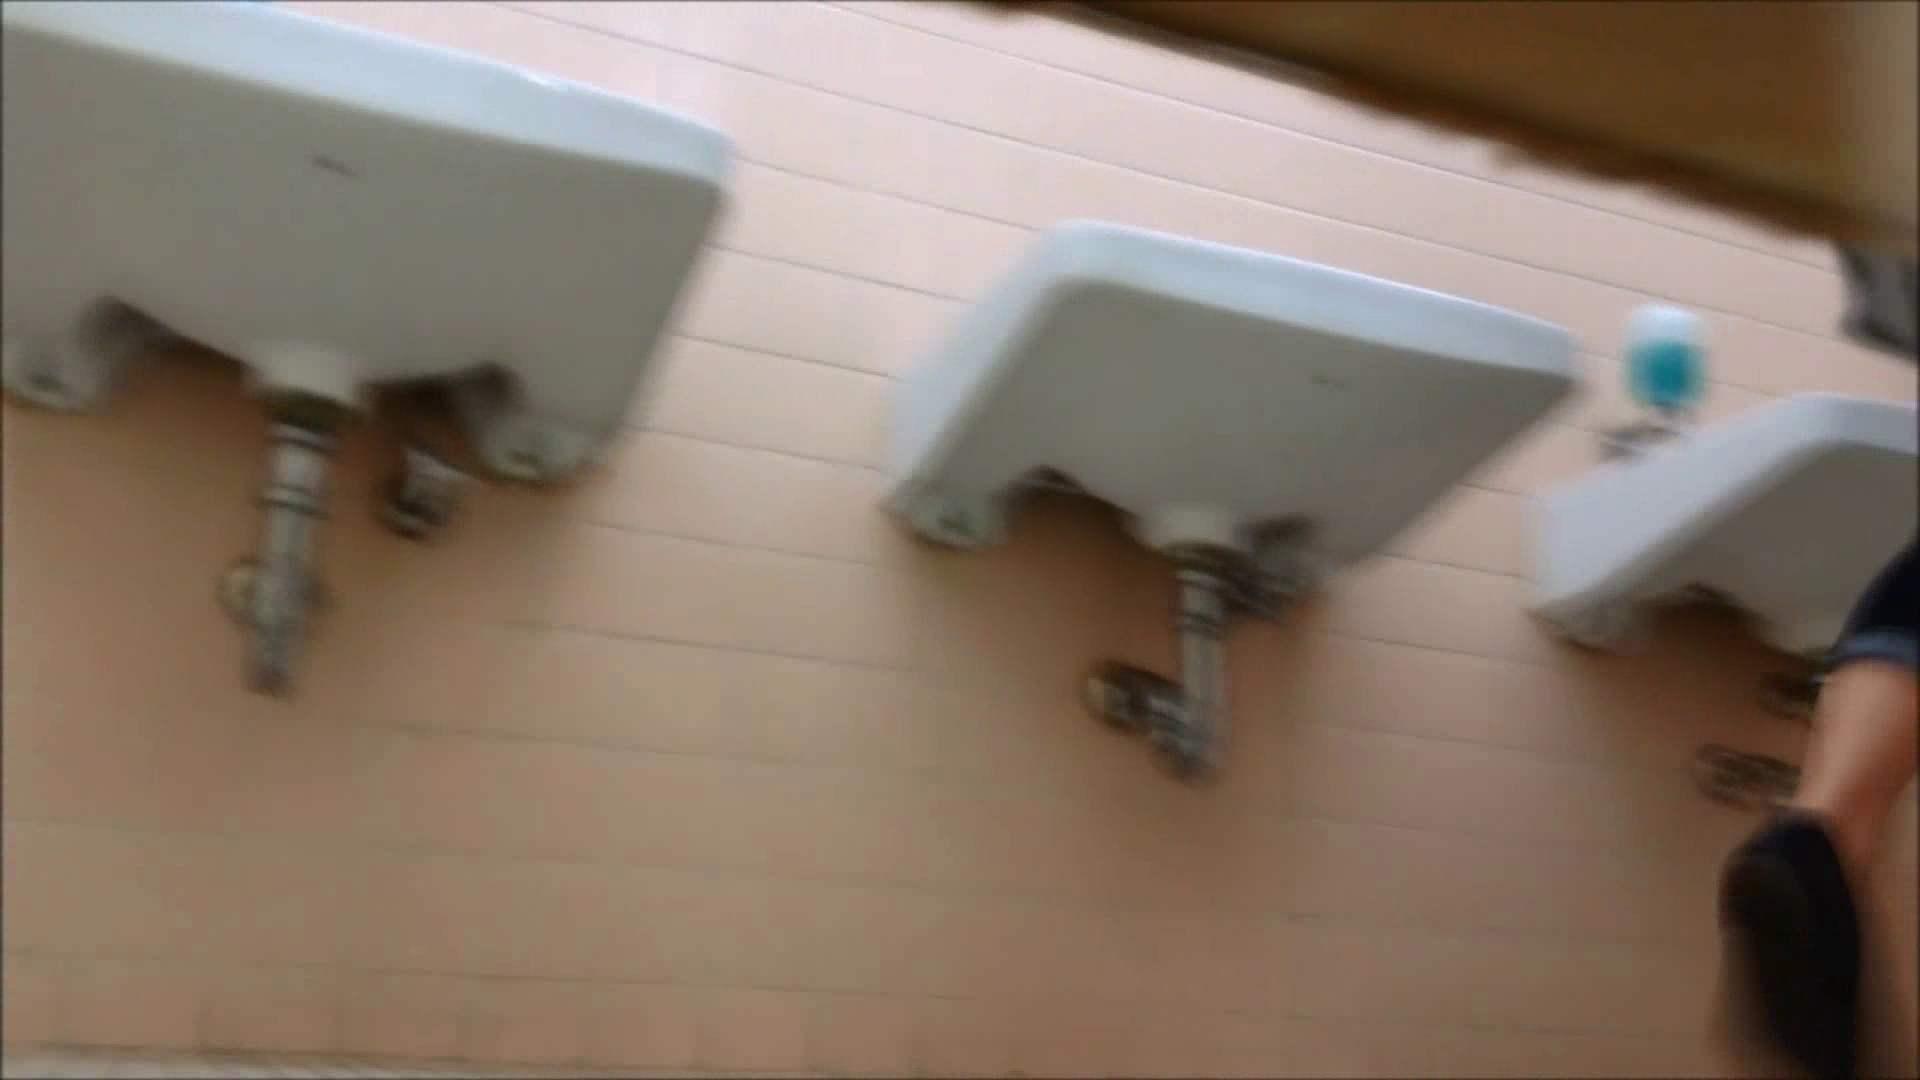 某有名大学女性洗面所 vol.17 和式 のぞき動画画像 108連発 55